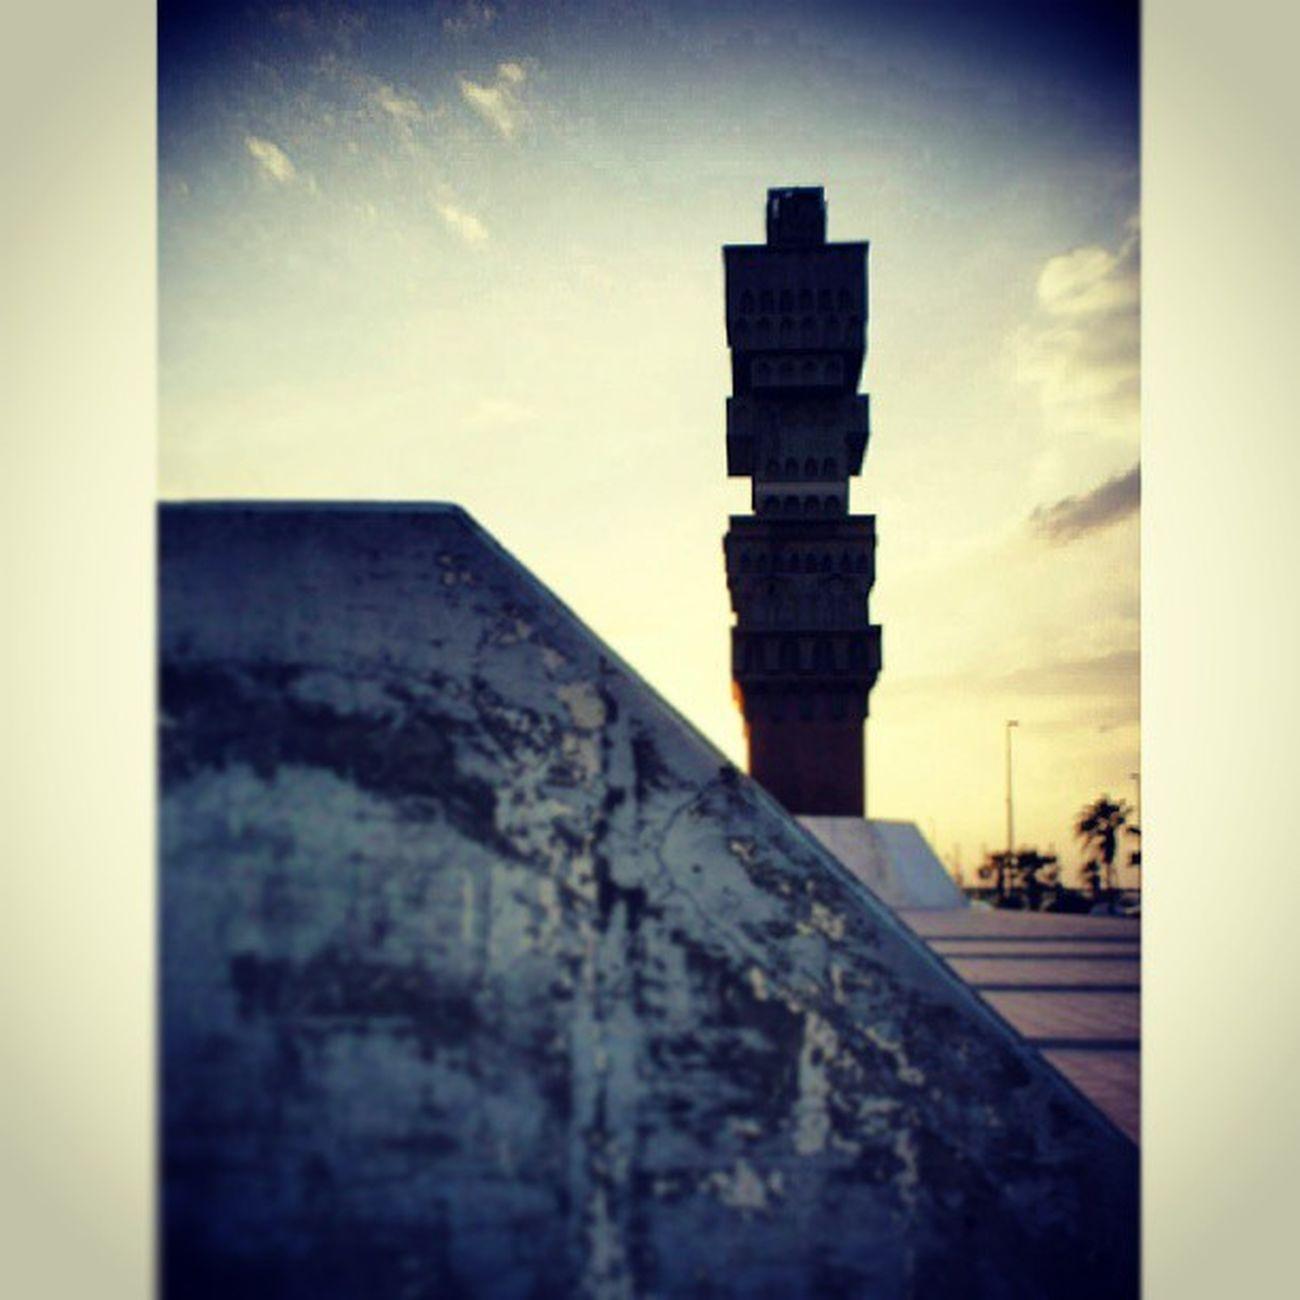 A Statue at Albalad Al_balad near the the NCB bank headquarter. jeddah saudi_arabia saudiarabia. Taken by my sonyalpha dslr A200. تمثال البلد بنك أهلي جدة السعودية